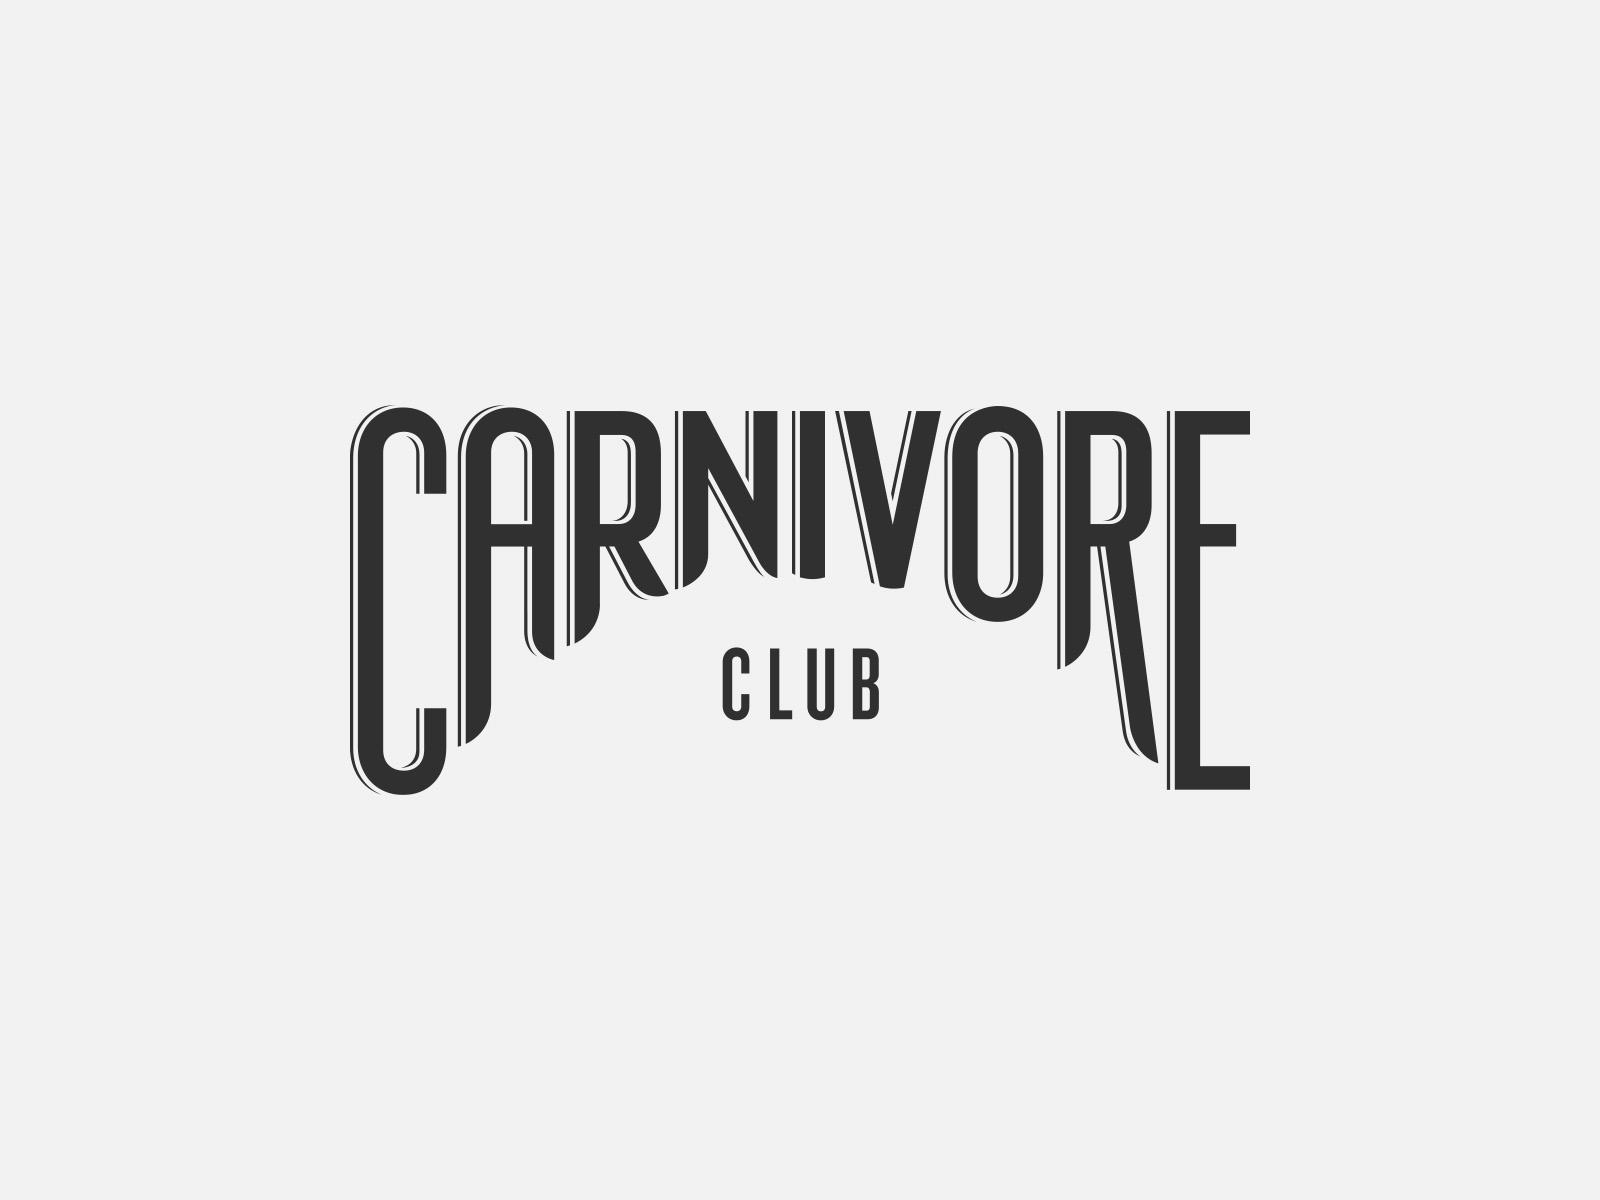 Carnivore Club by Leo Burnett Design